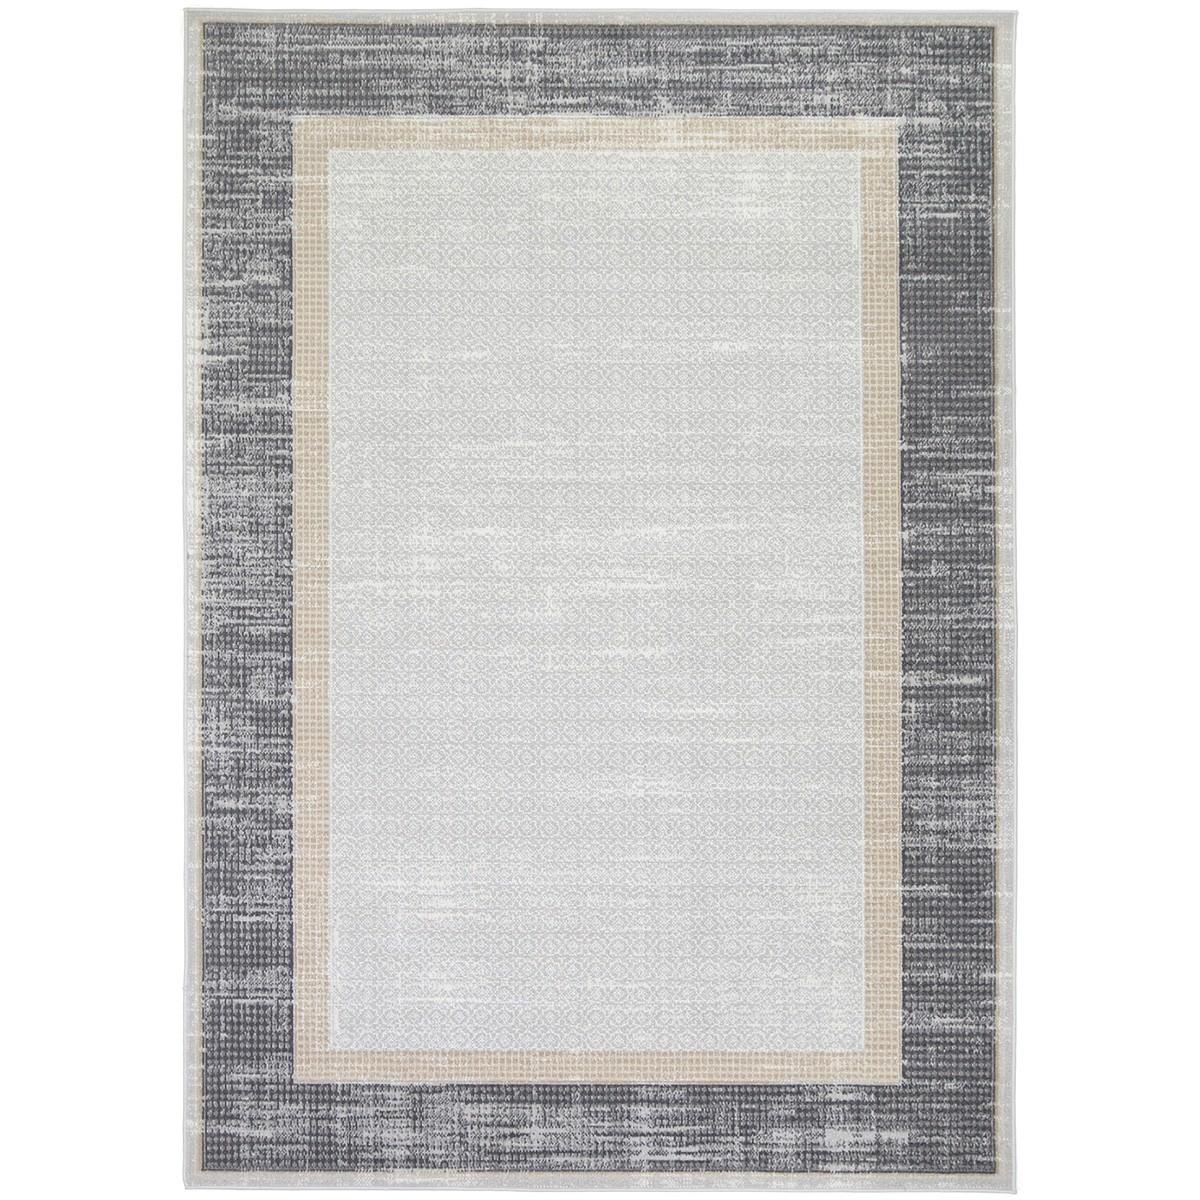 Courtyard New York Modern Rug, 150x80cm, Grey / Charcoal